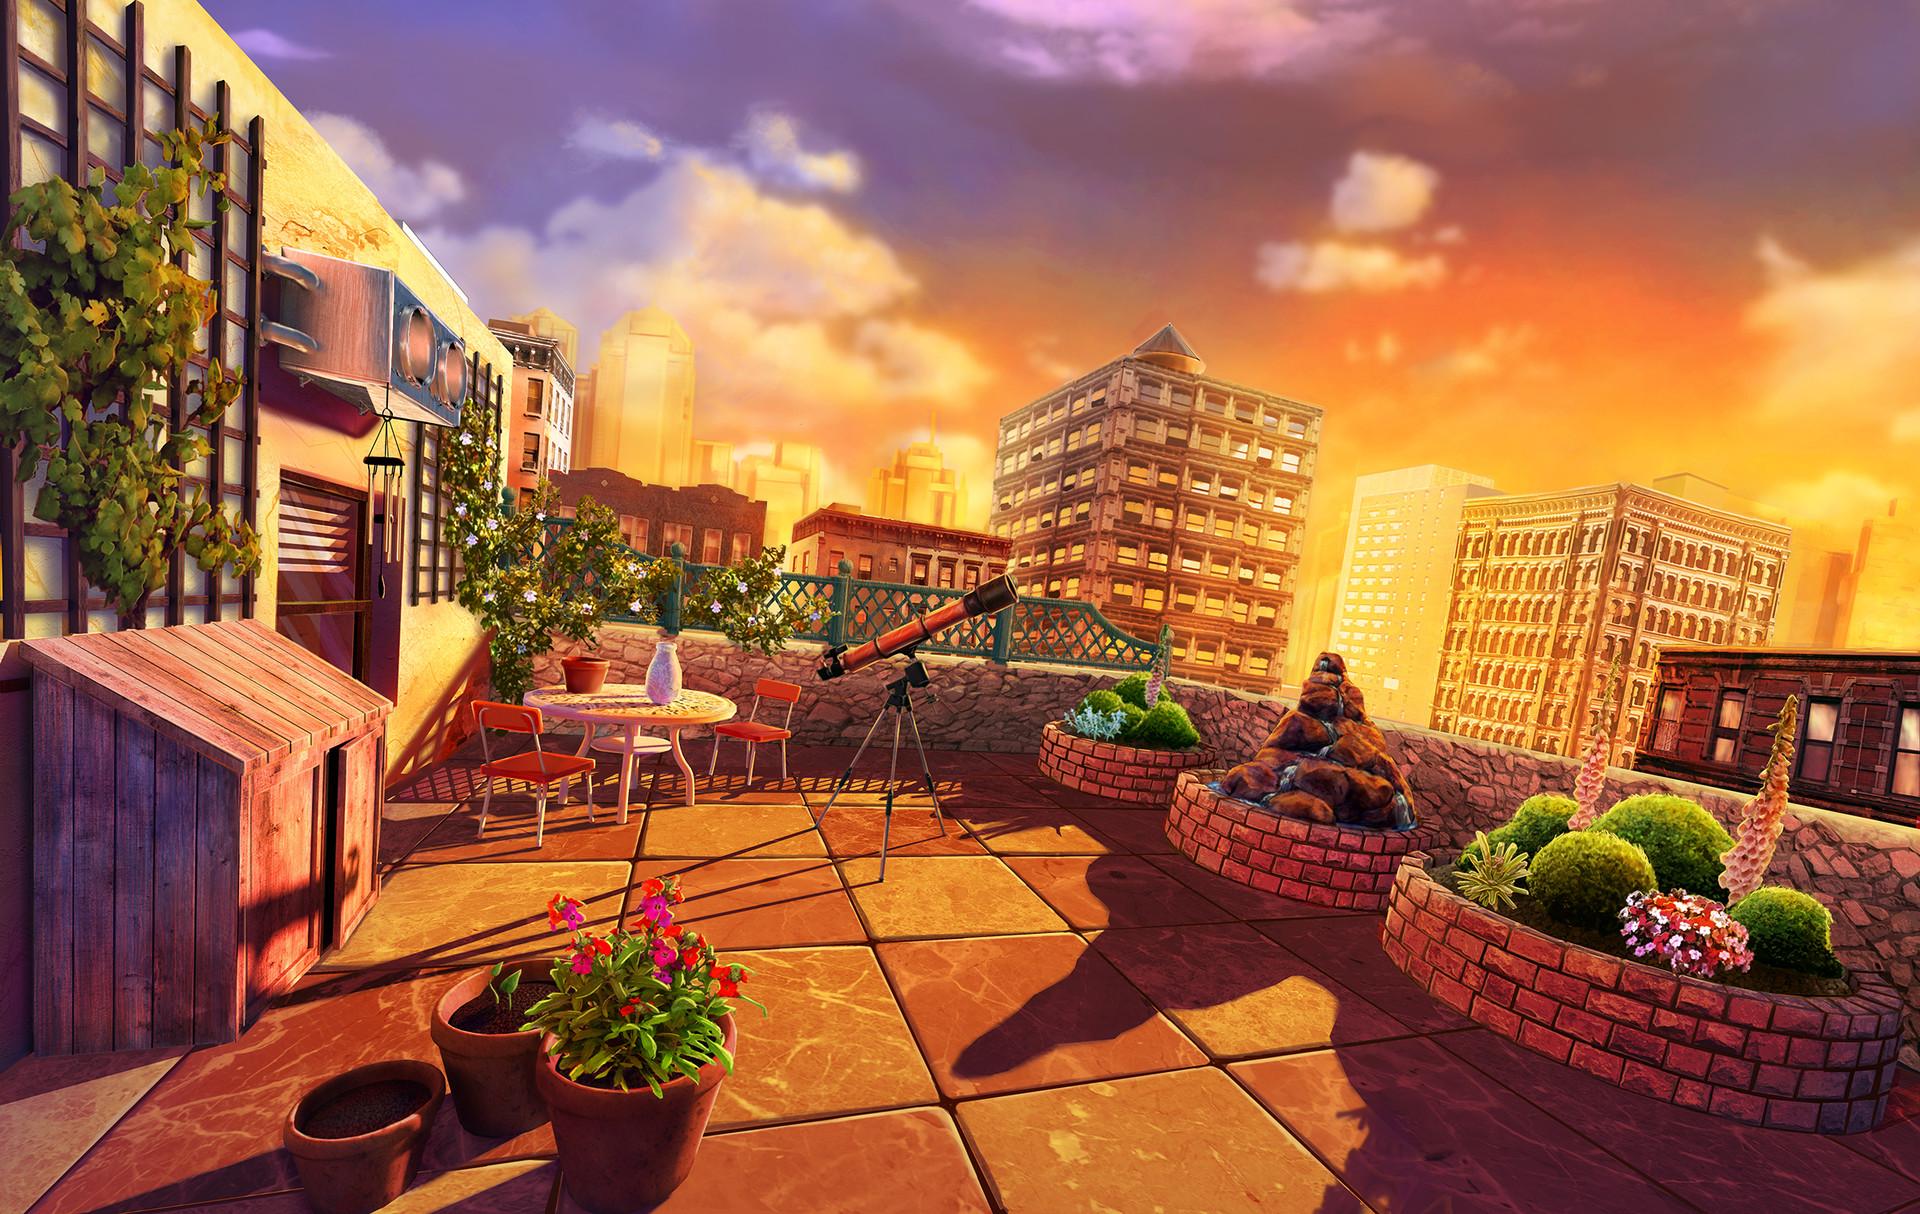 Rob smyth rooftop garden final sky